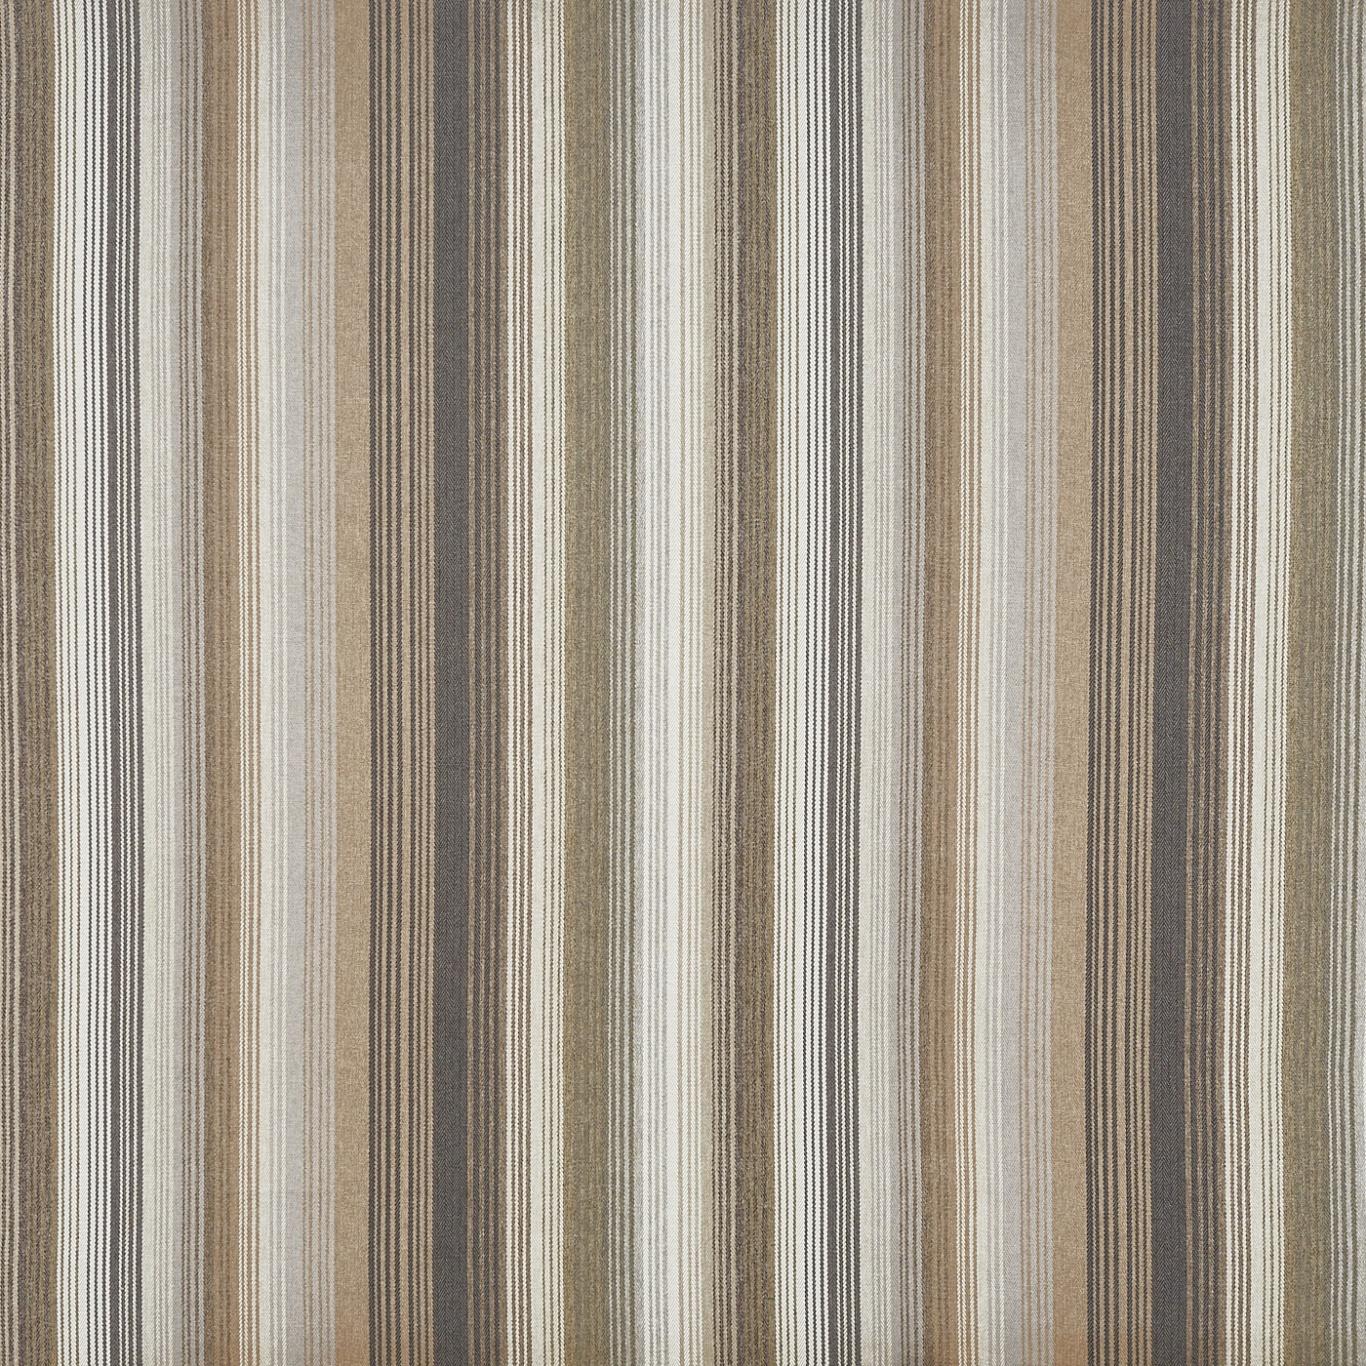 Image of Prestigious Harley Marble Fabric 3690/018